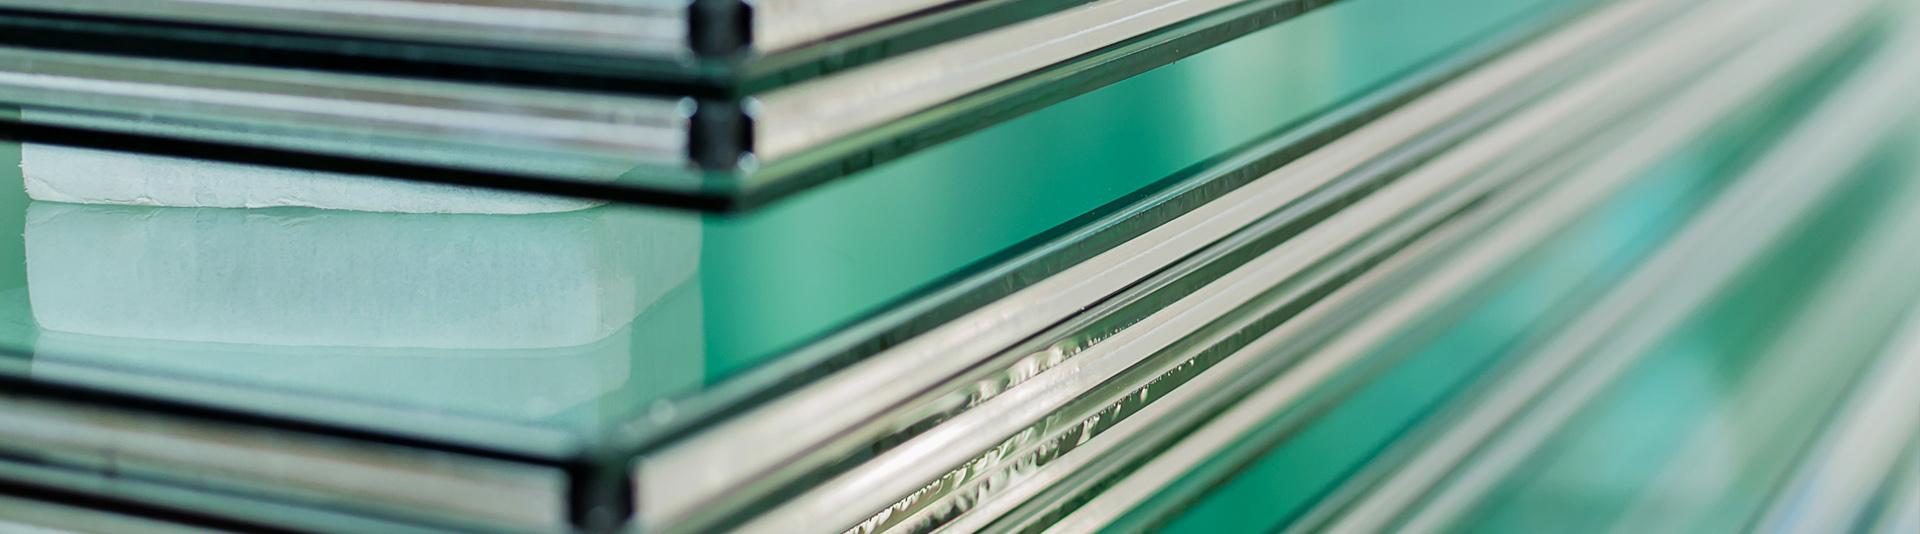 slide-izolacijsko-steklo